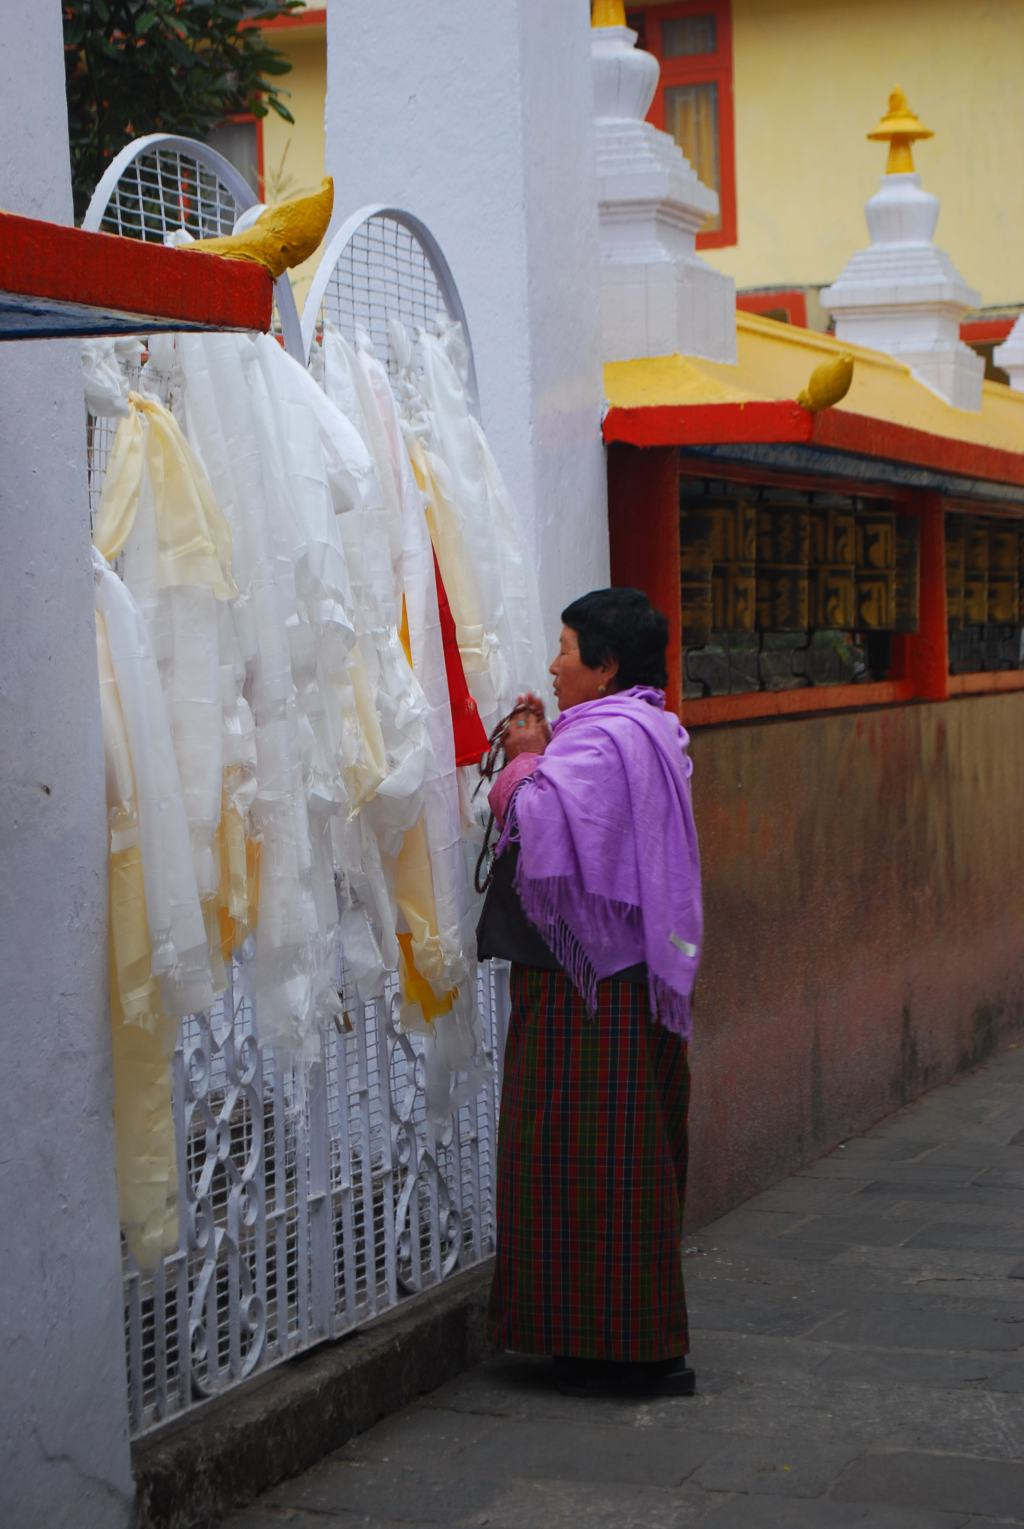 gangtok sikkim northeast india Buddhism monastery faith